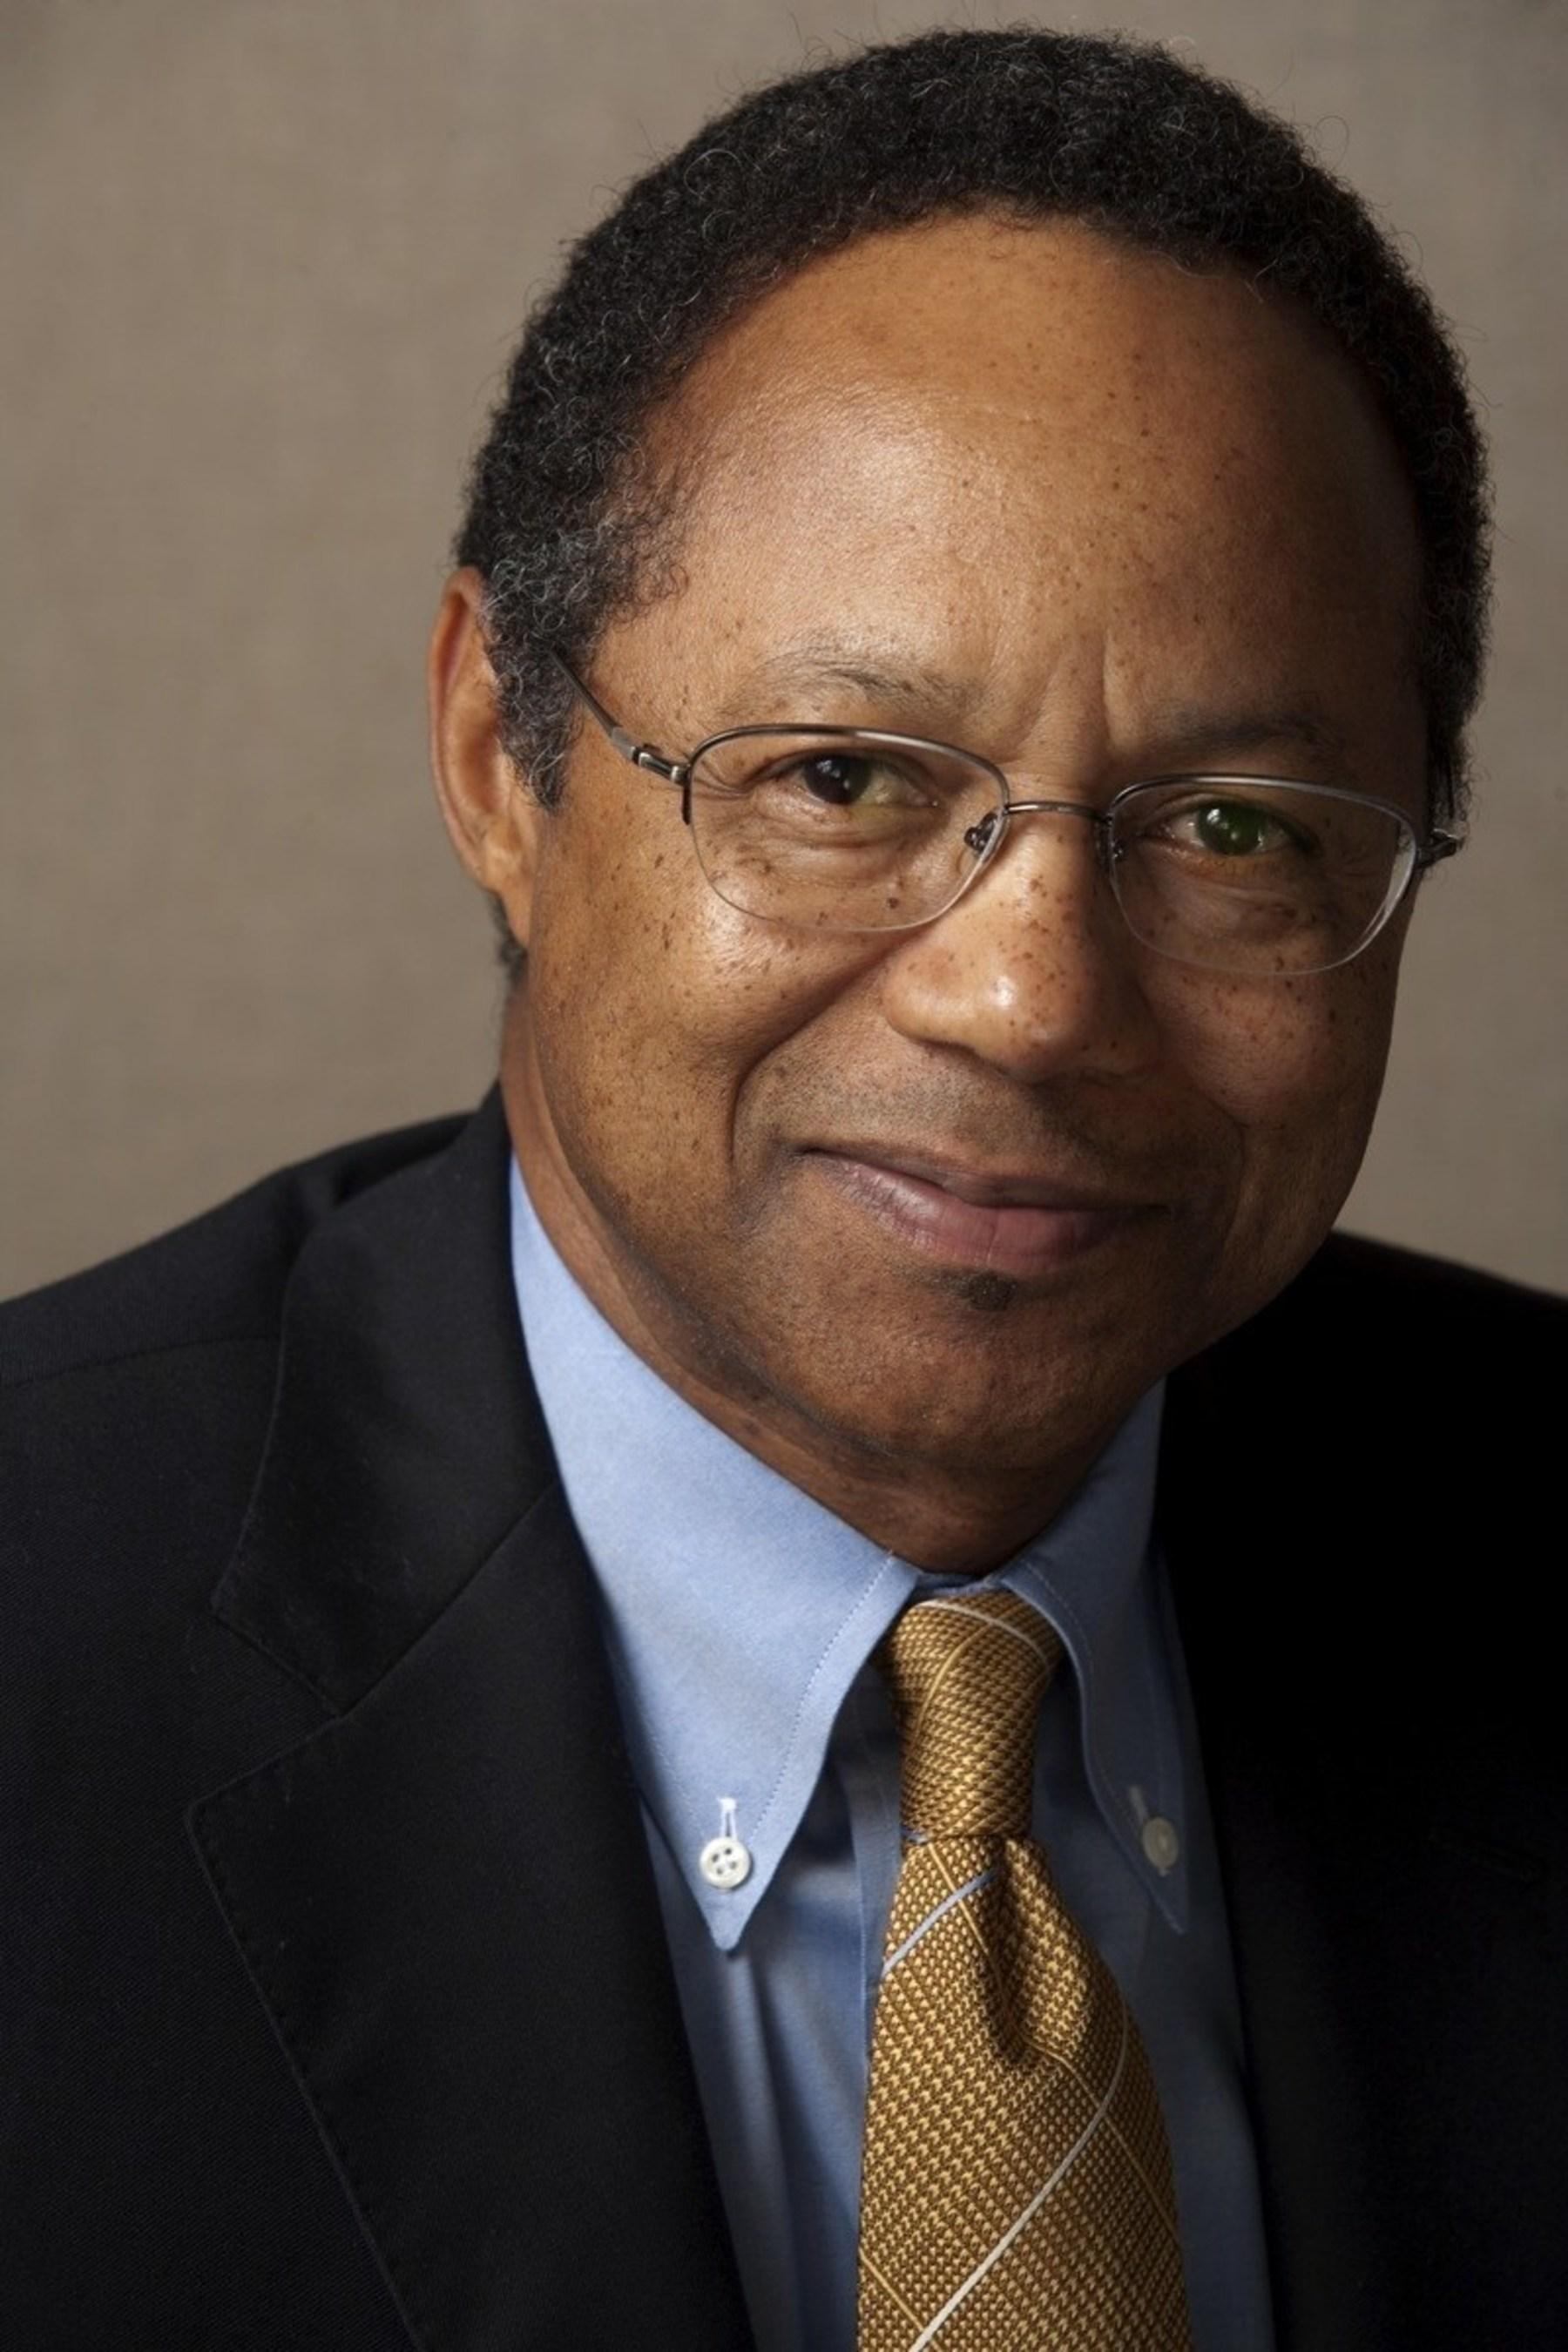 Eugene Washington Md Joins Kaiser Foundation Health Plan Inc And